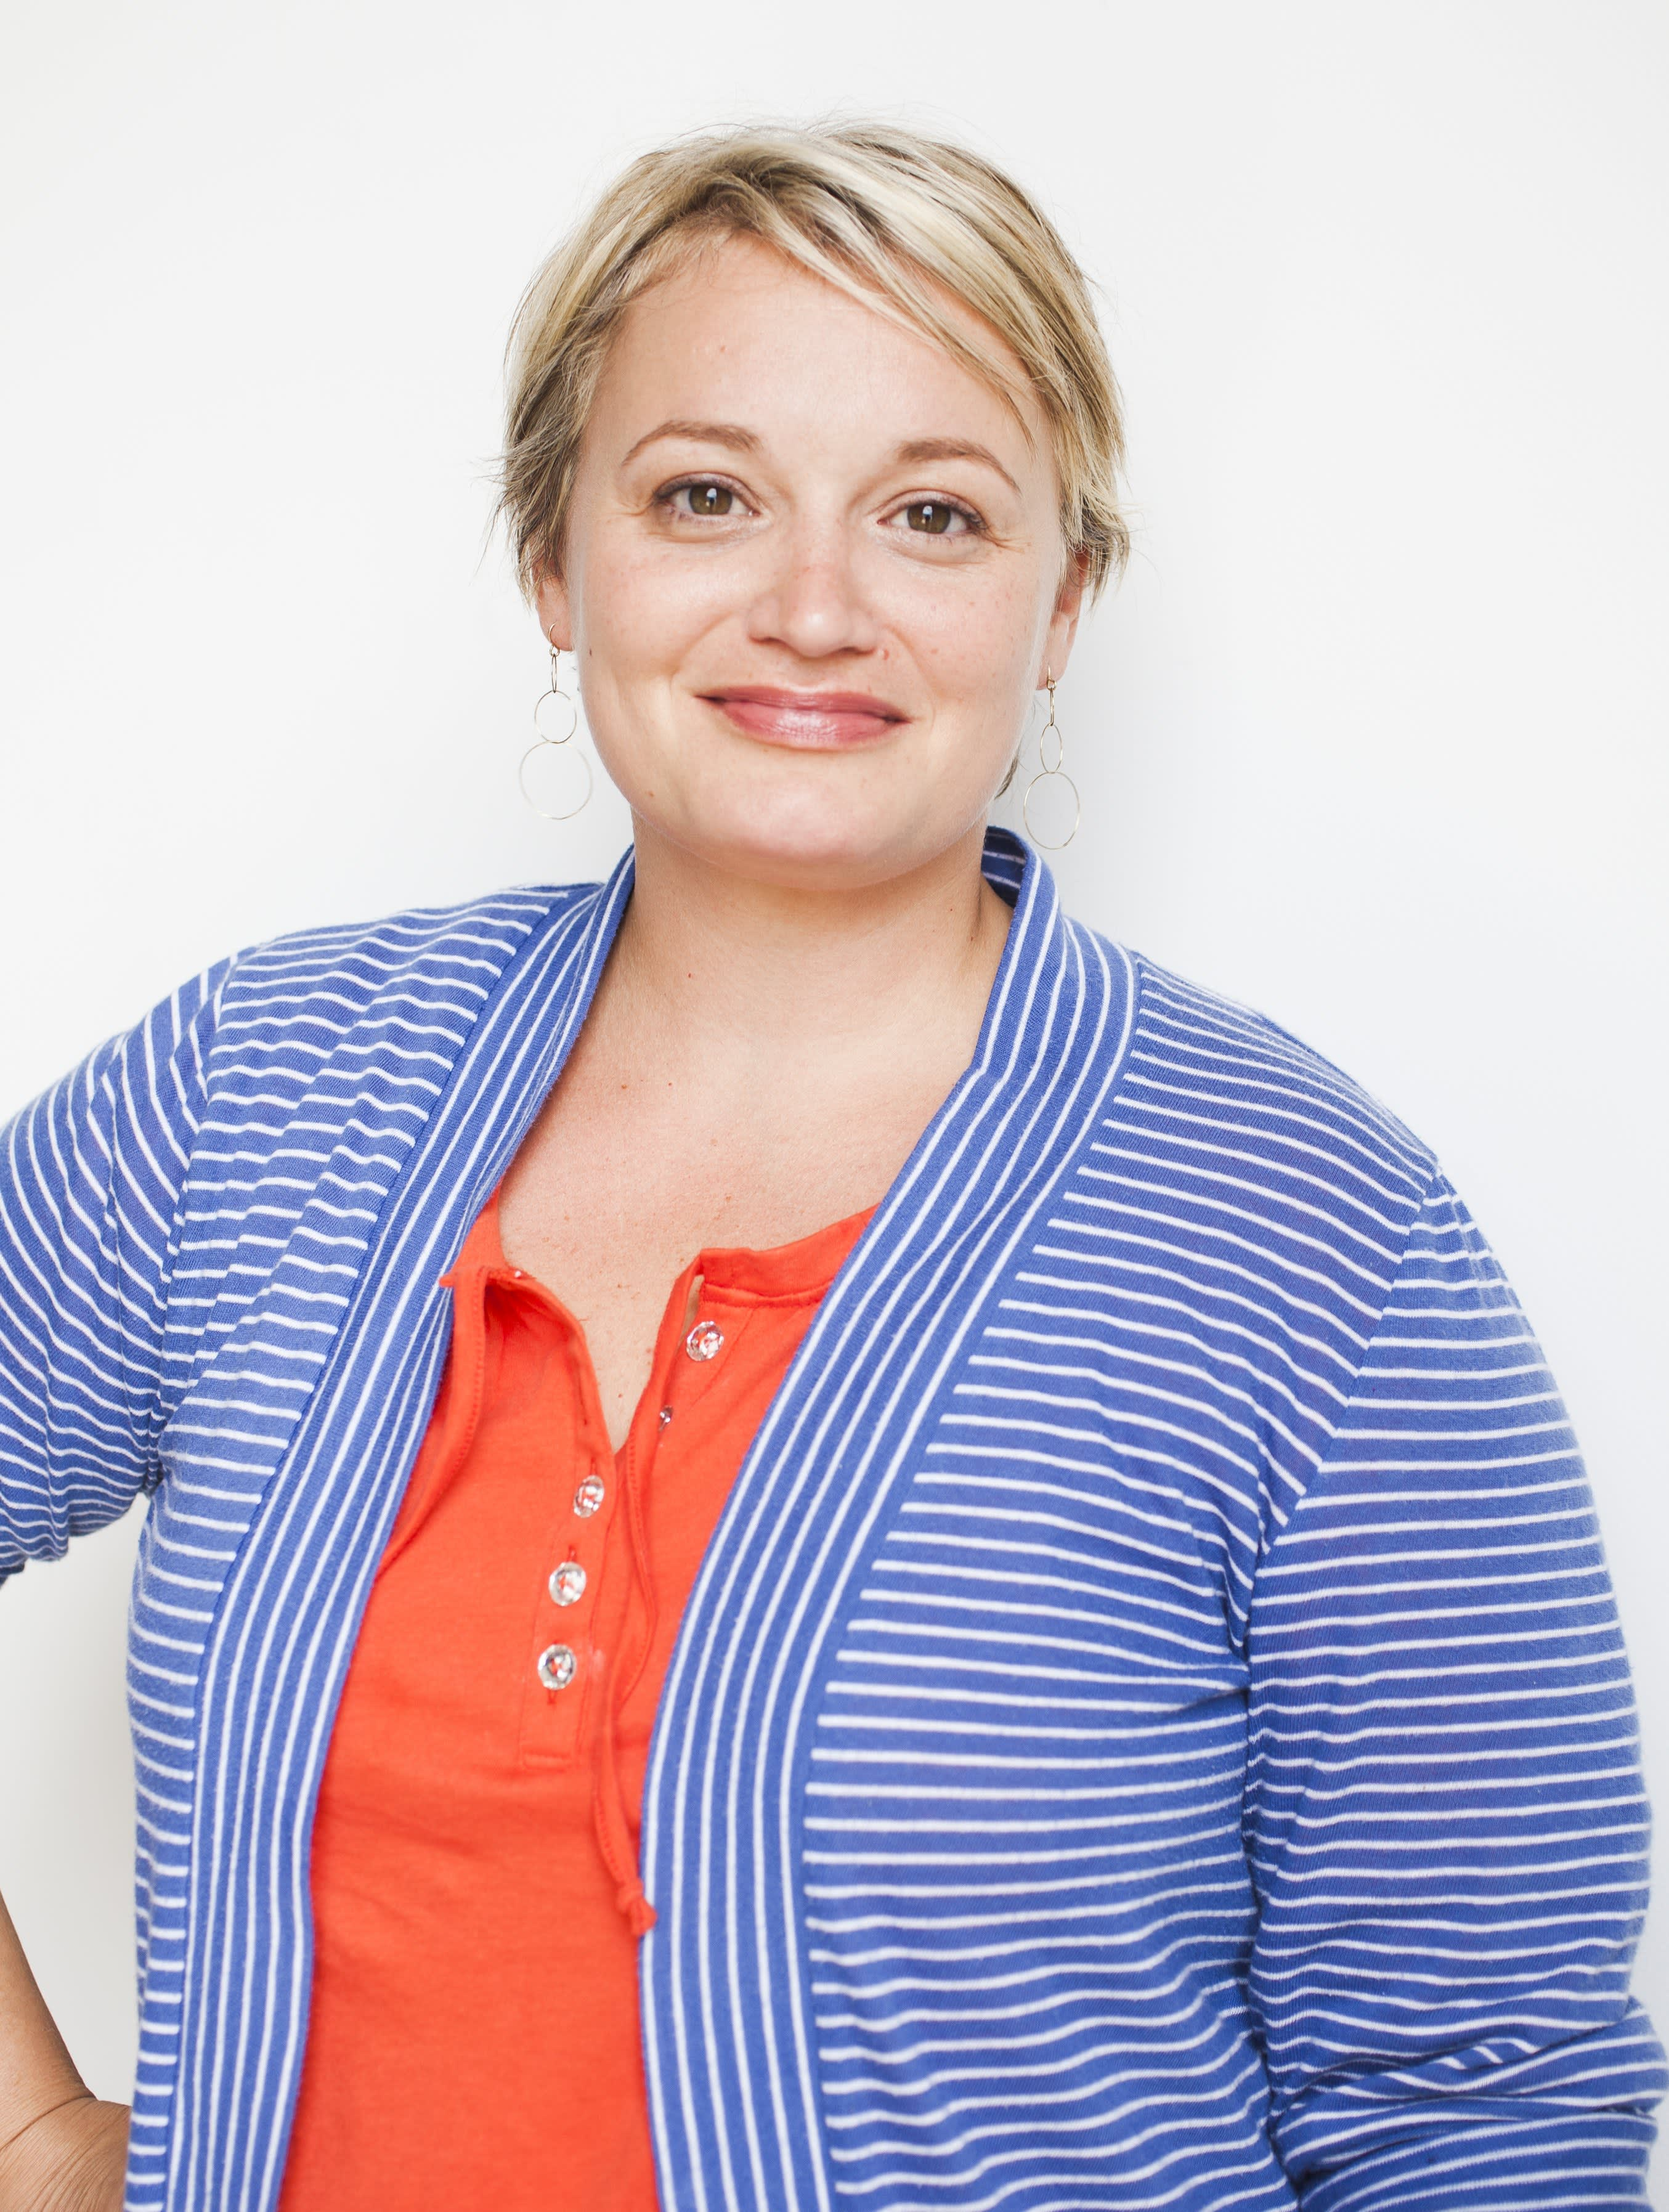 Stephanie Gerber